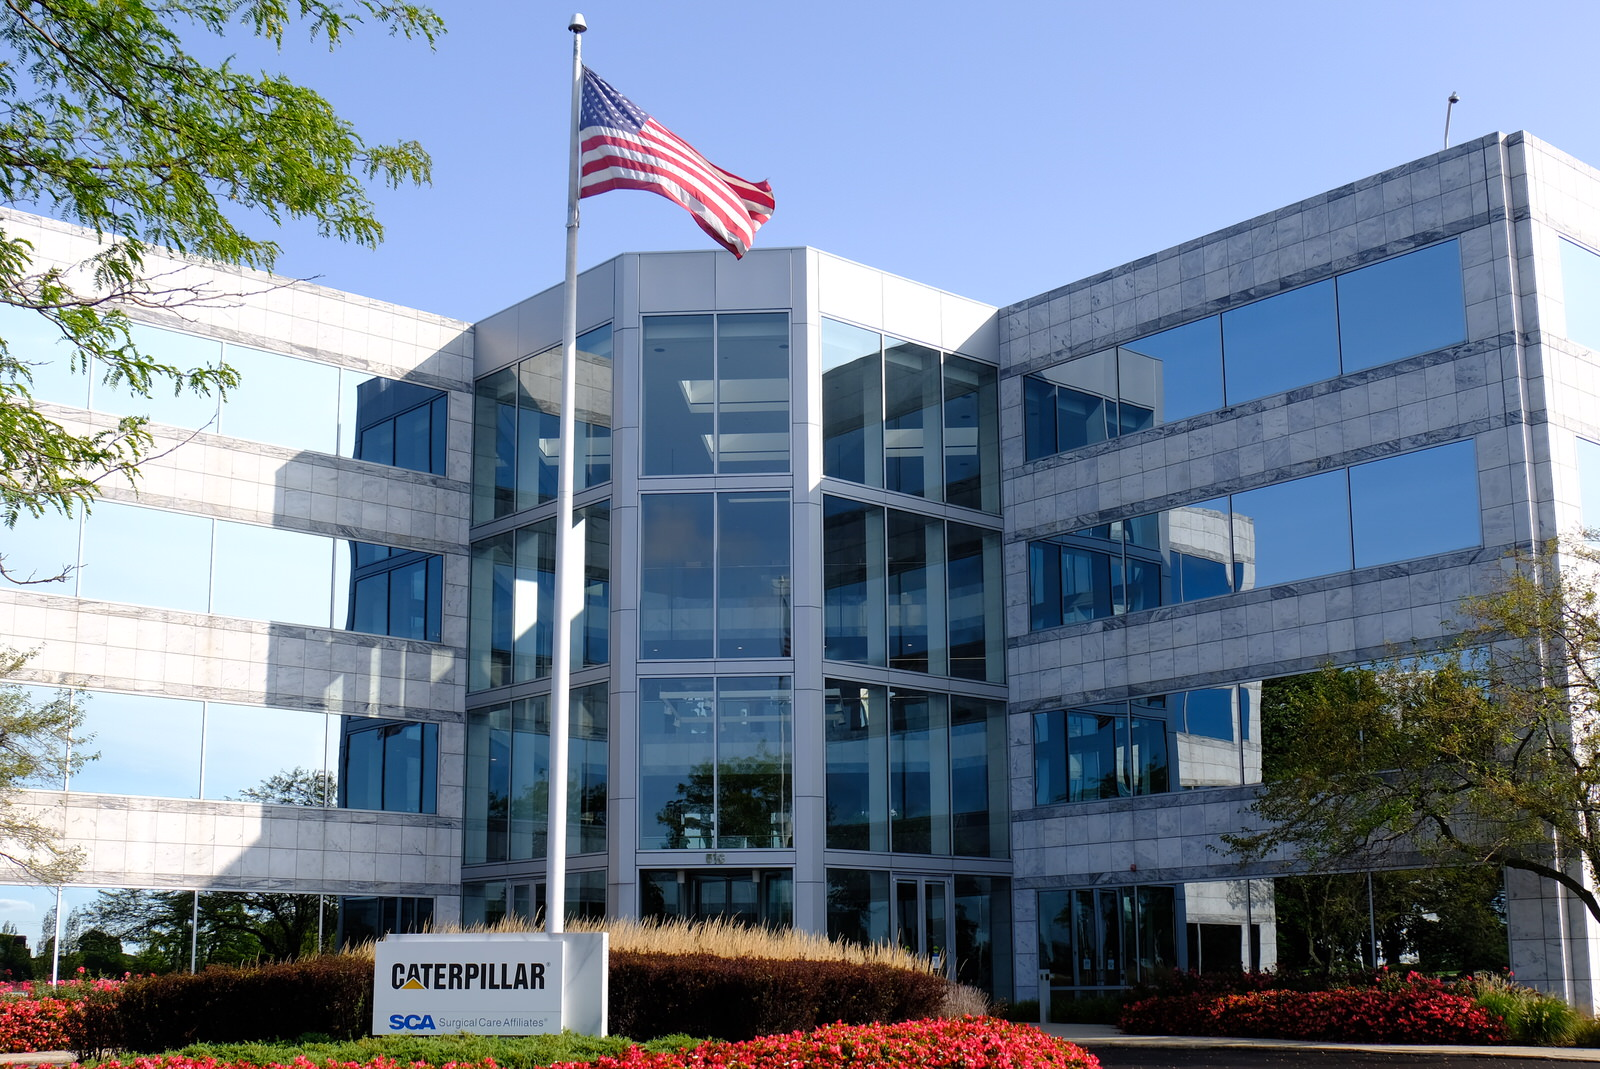 Caterpillar's corporate headquarters in Deerfield, Illinois.